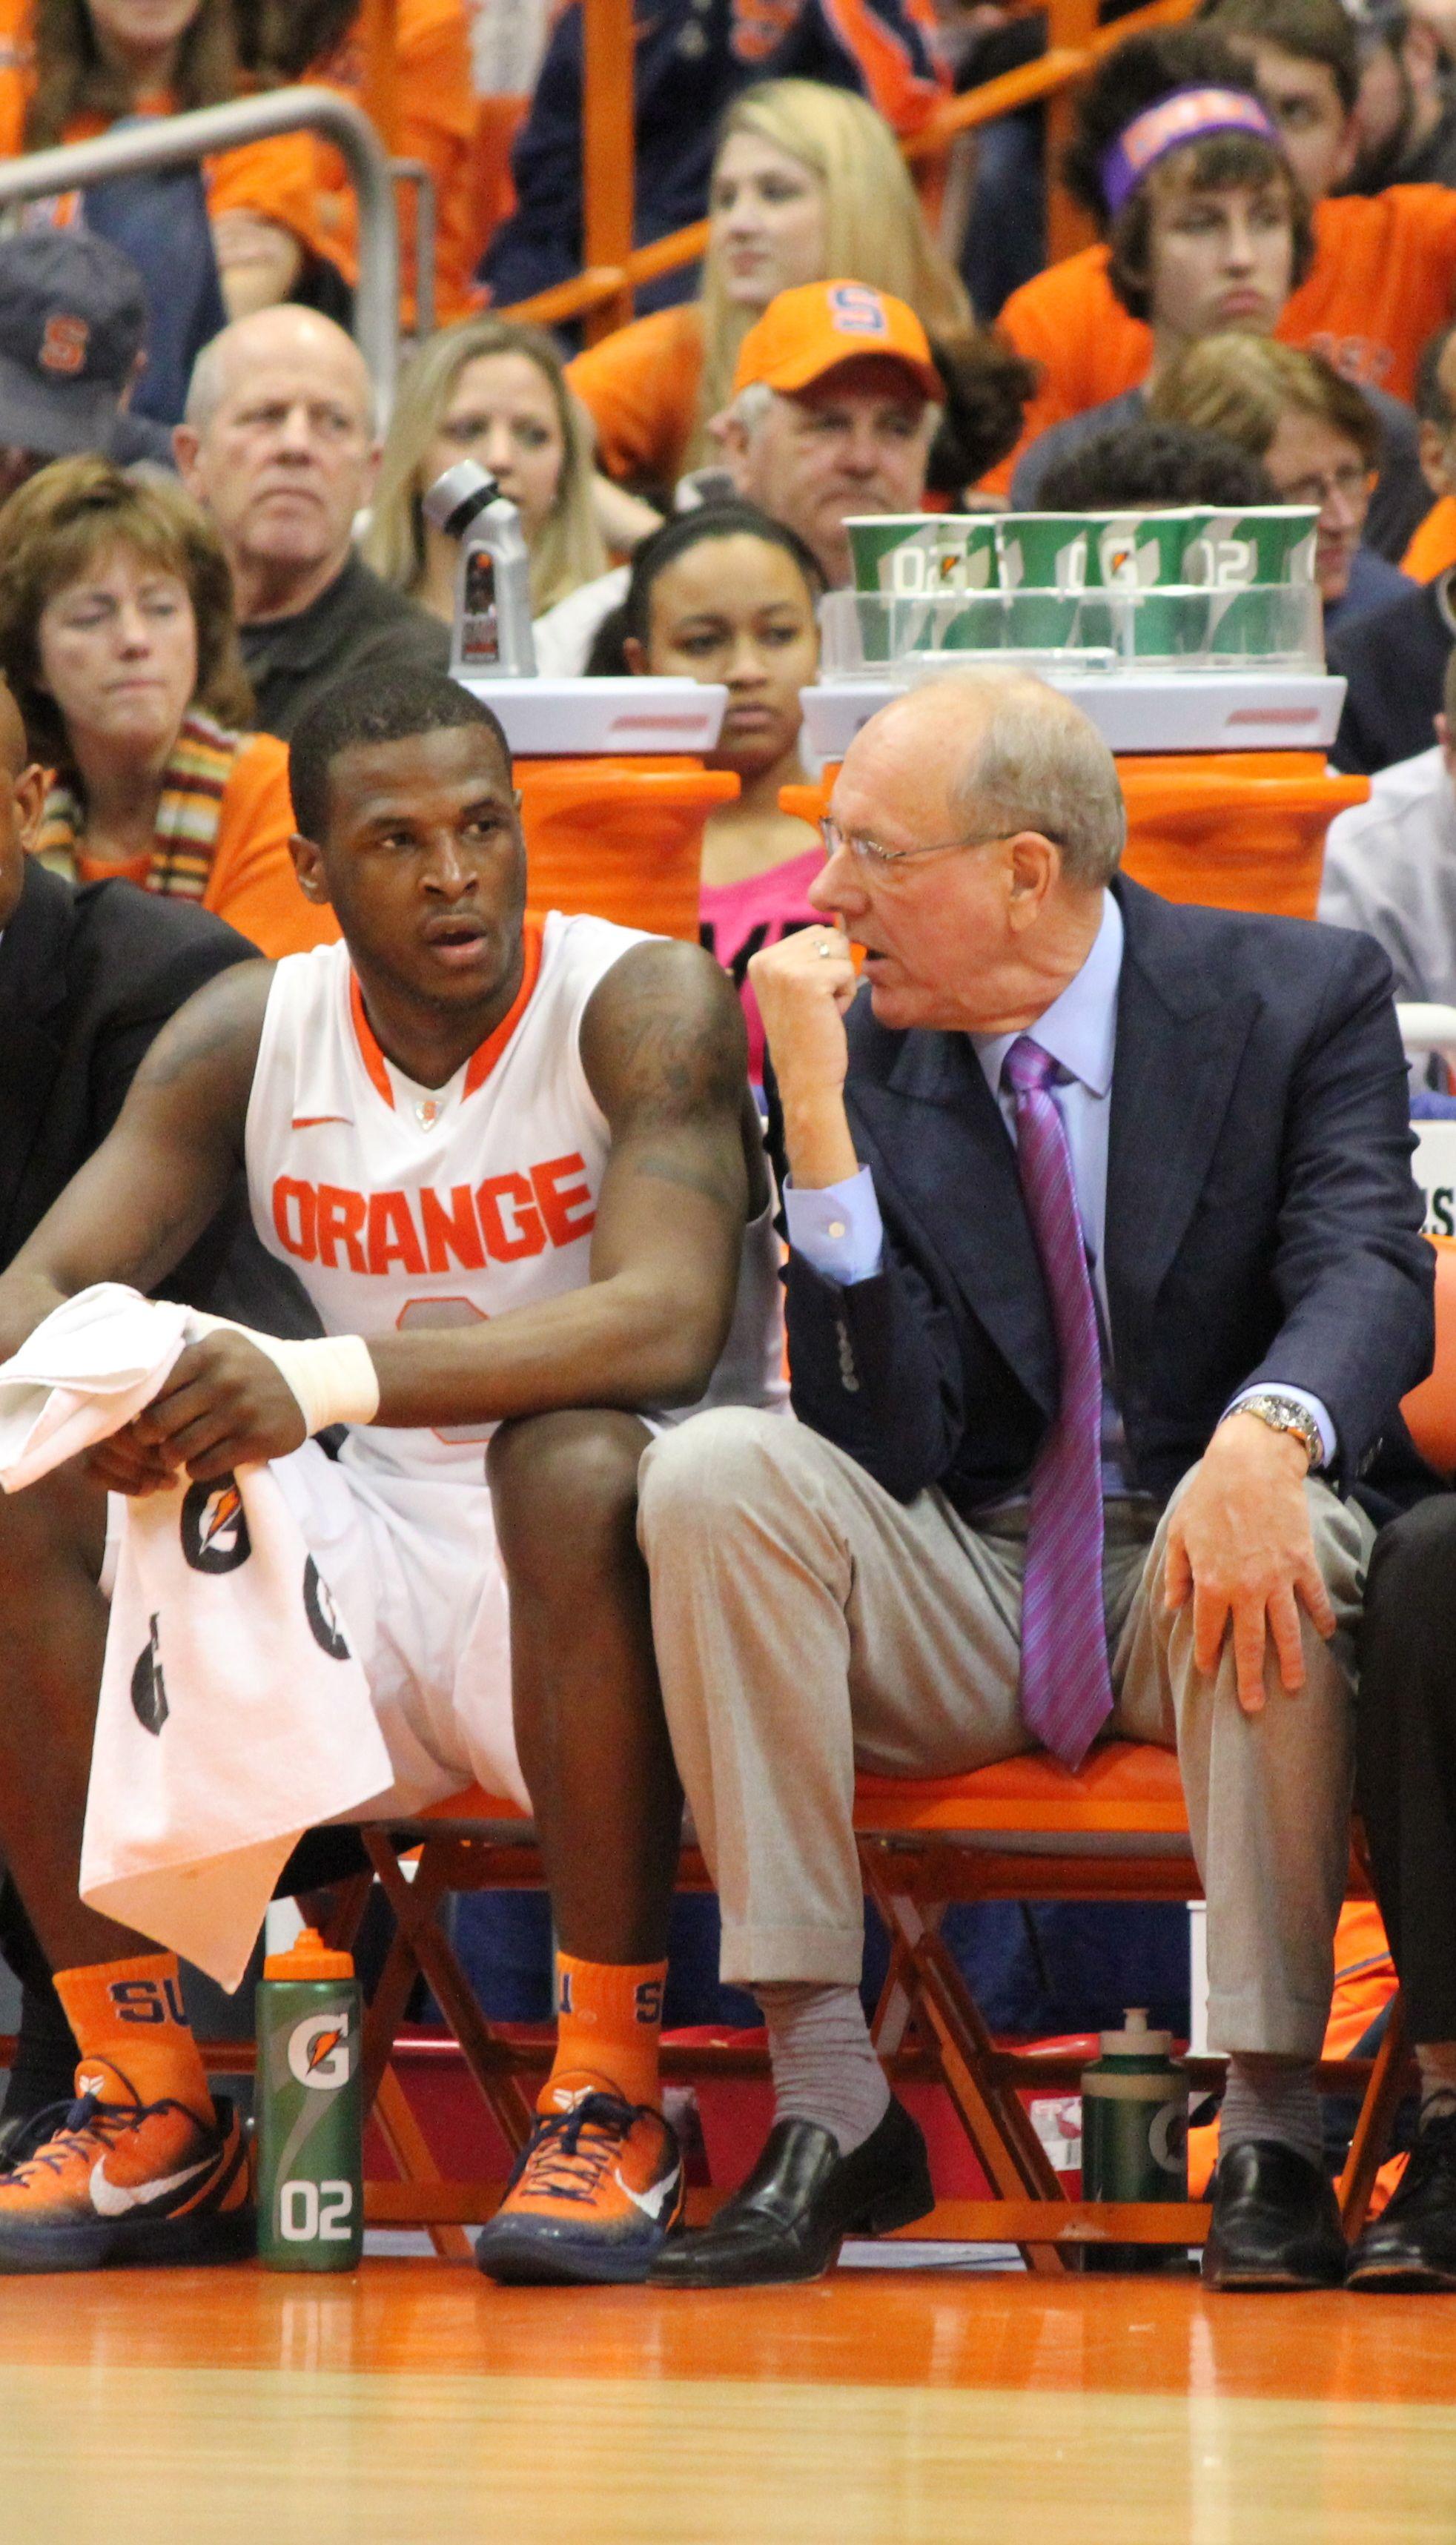 Awesome! SU basketball Syracuse basketball, Syracuse